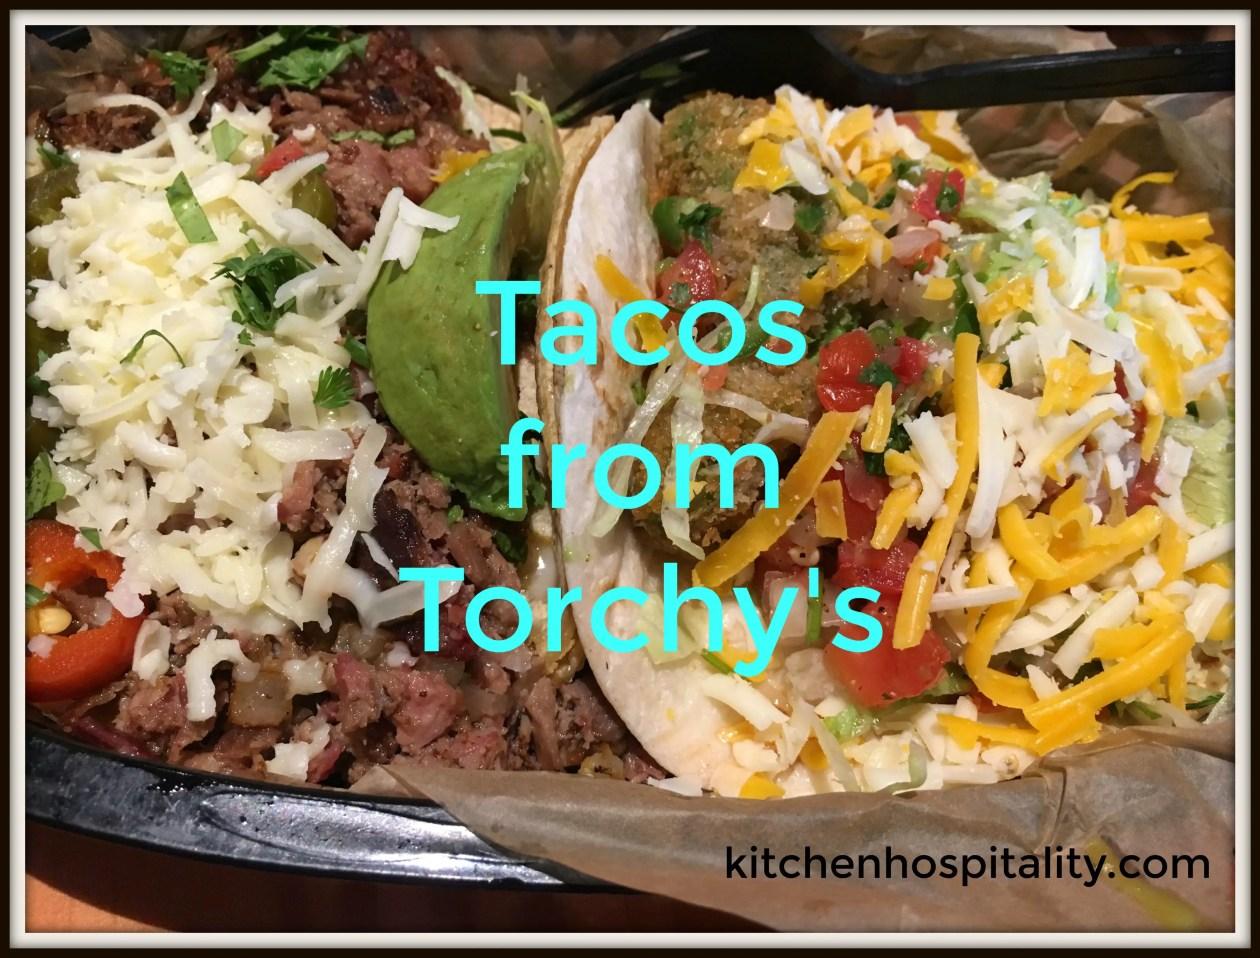 Torchy's in Houston, TX